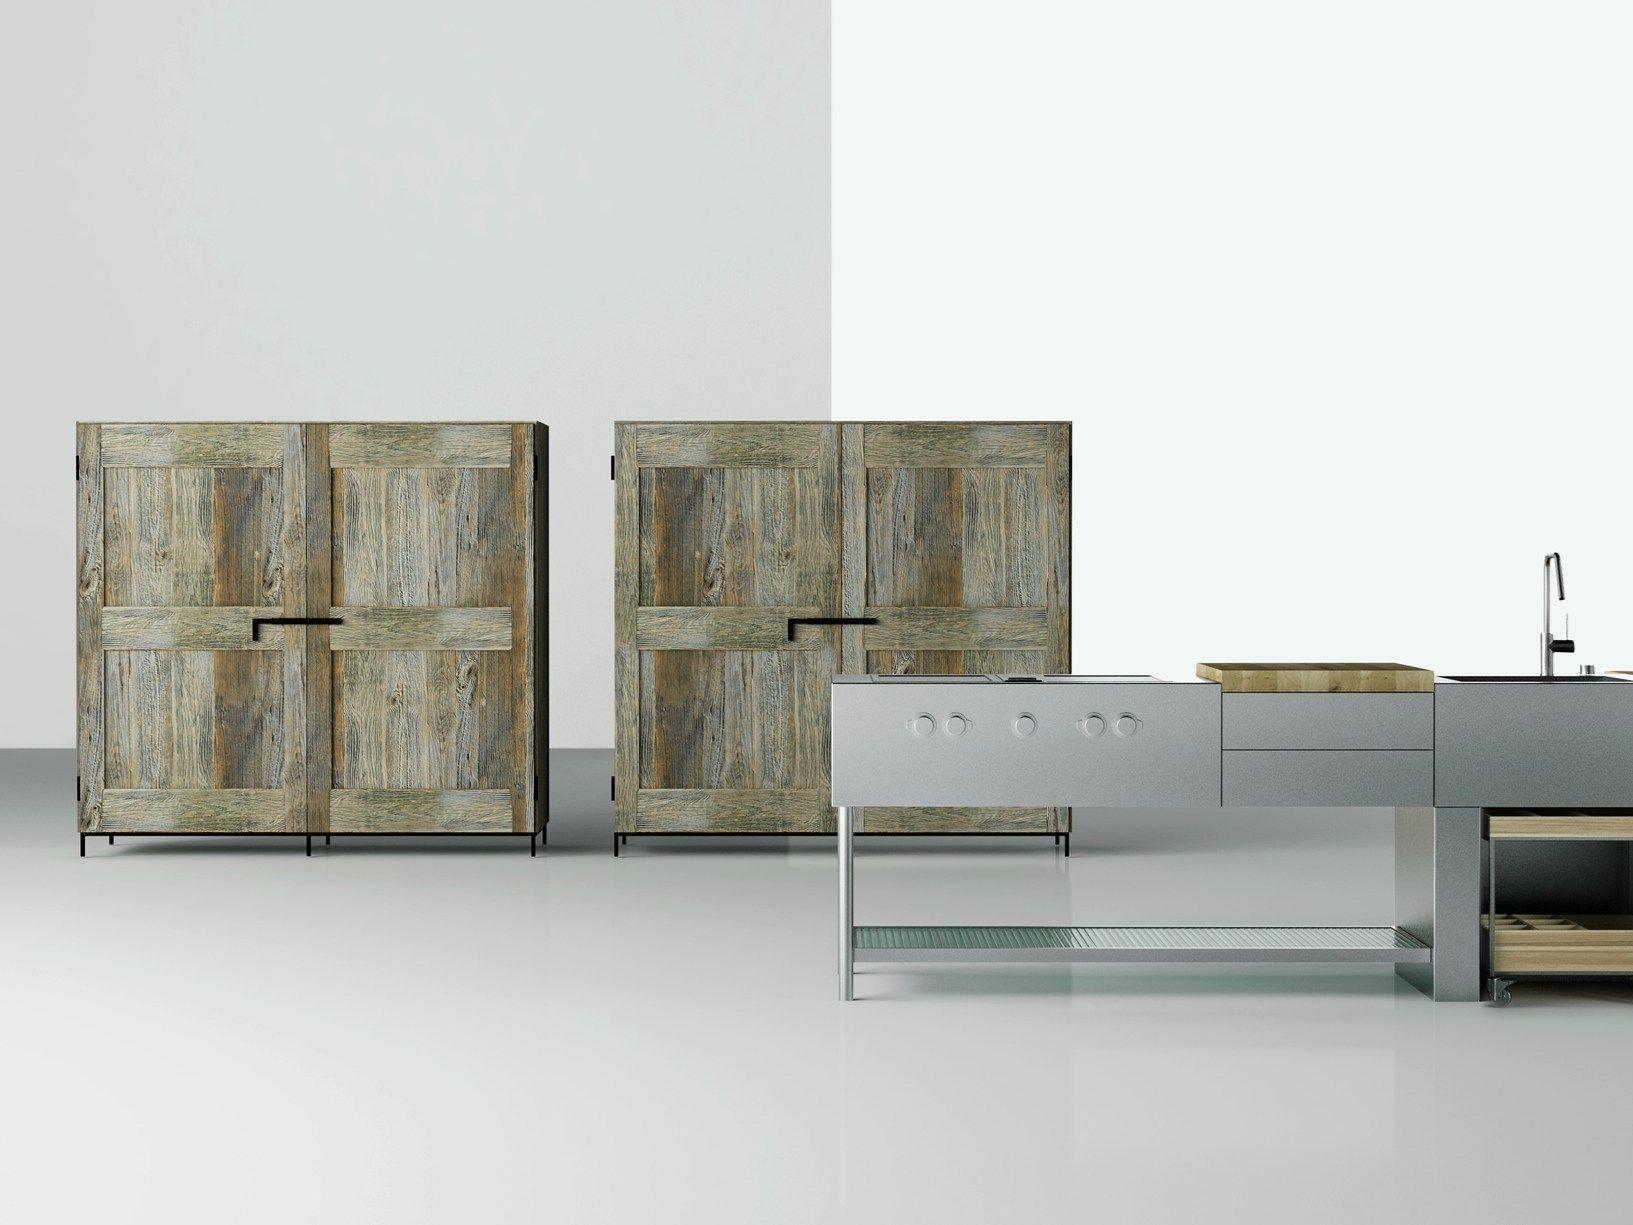 Boffi Köln presents open at bologna water design